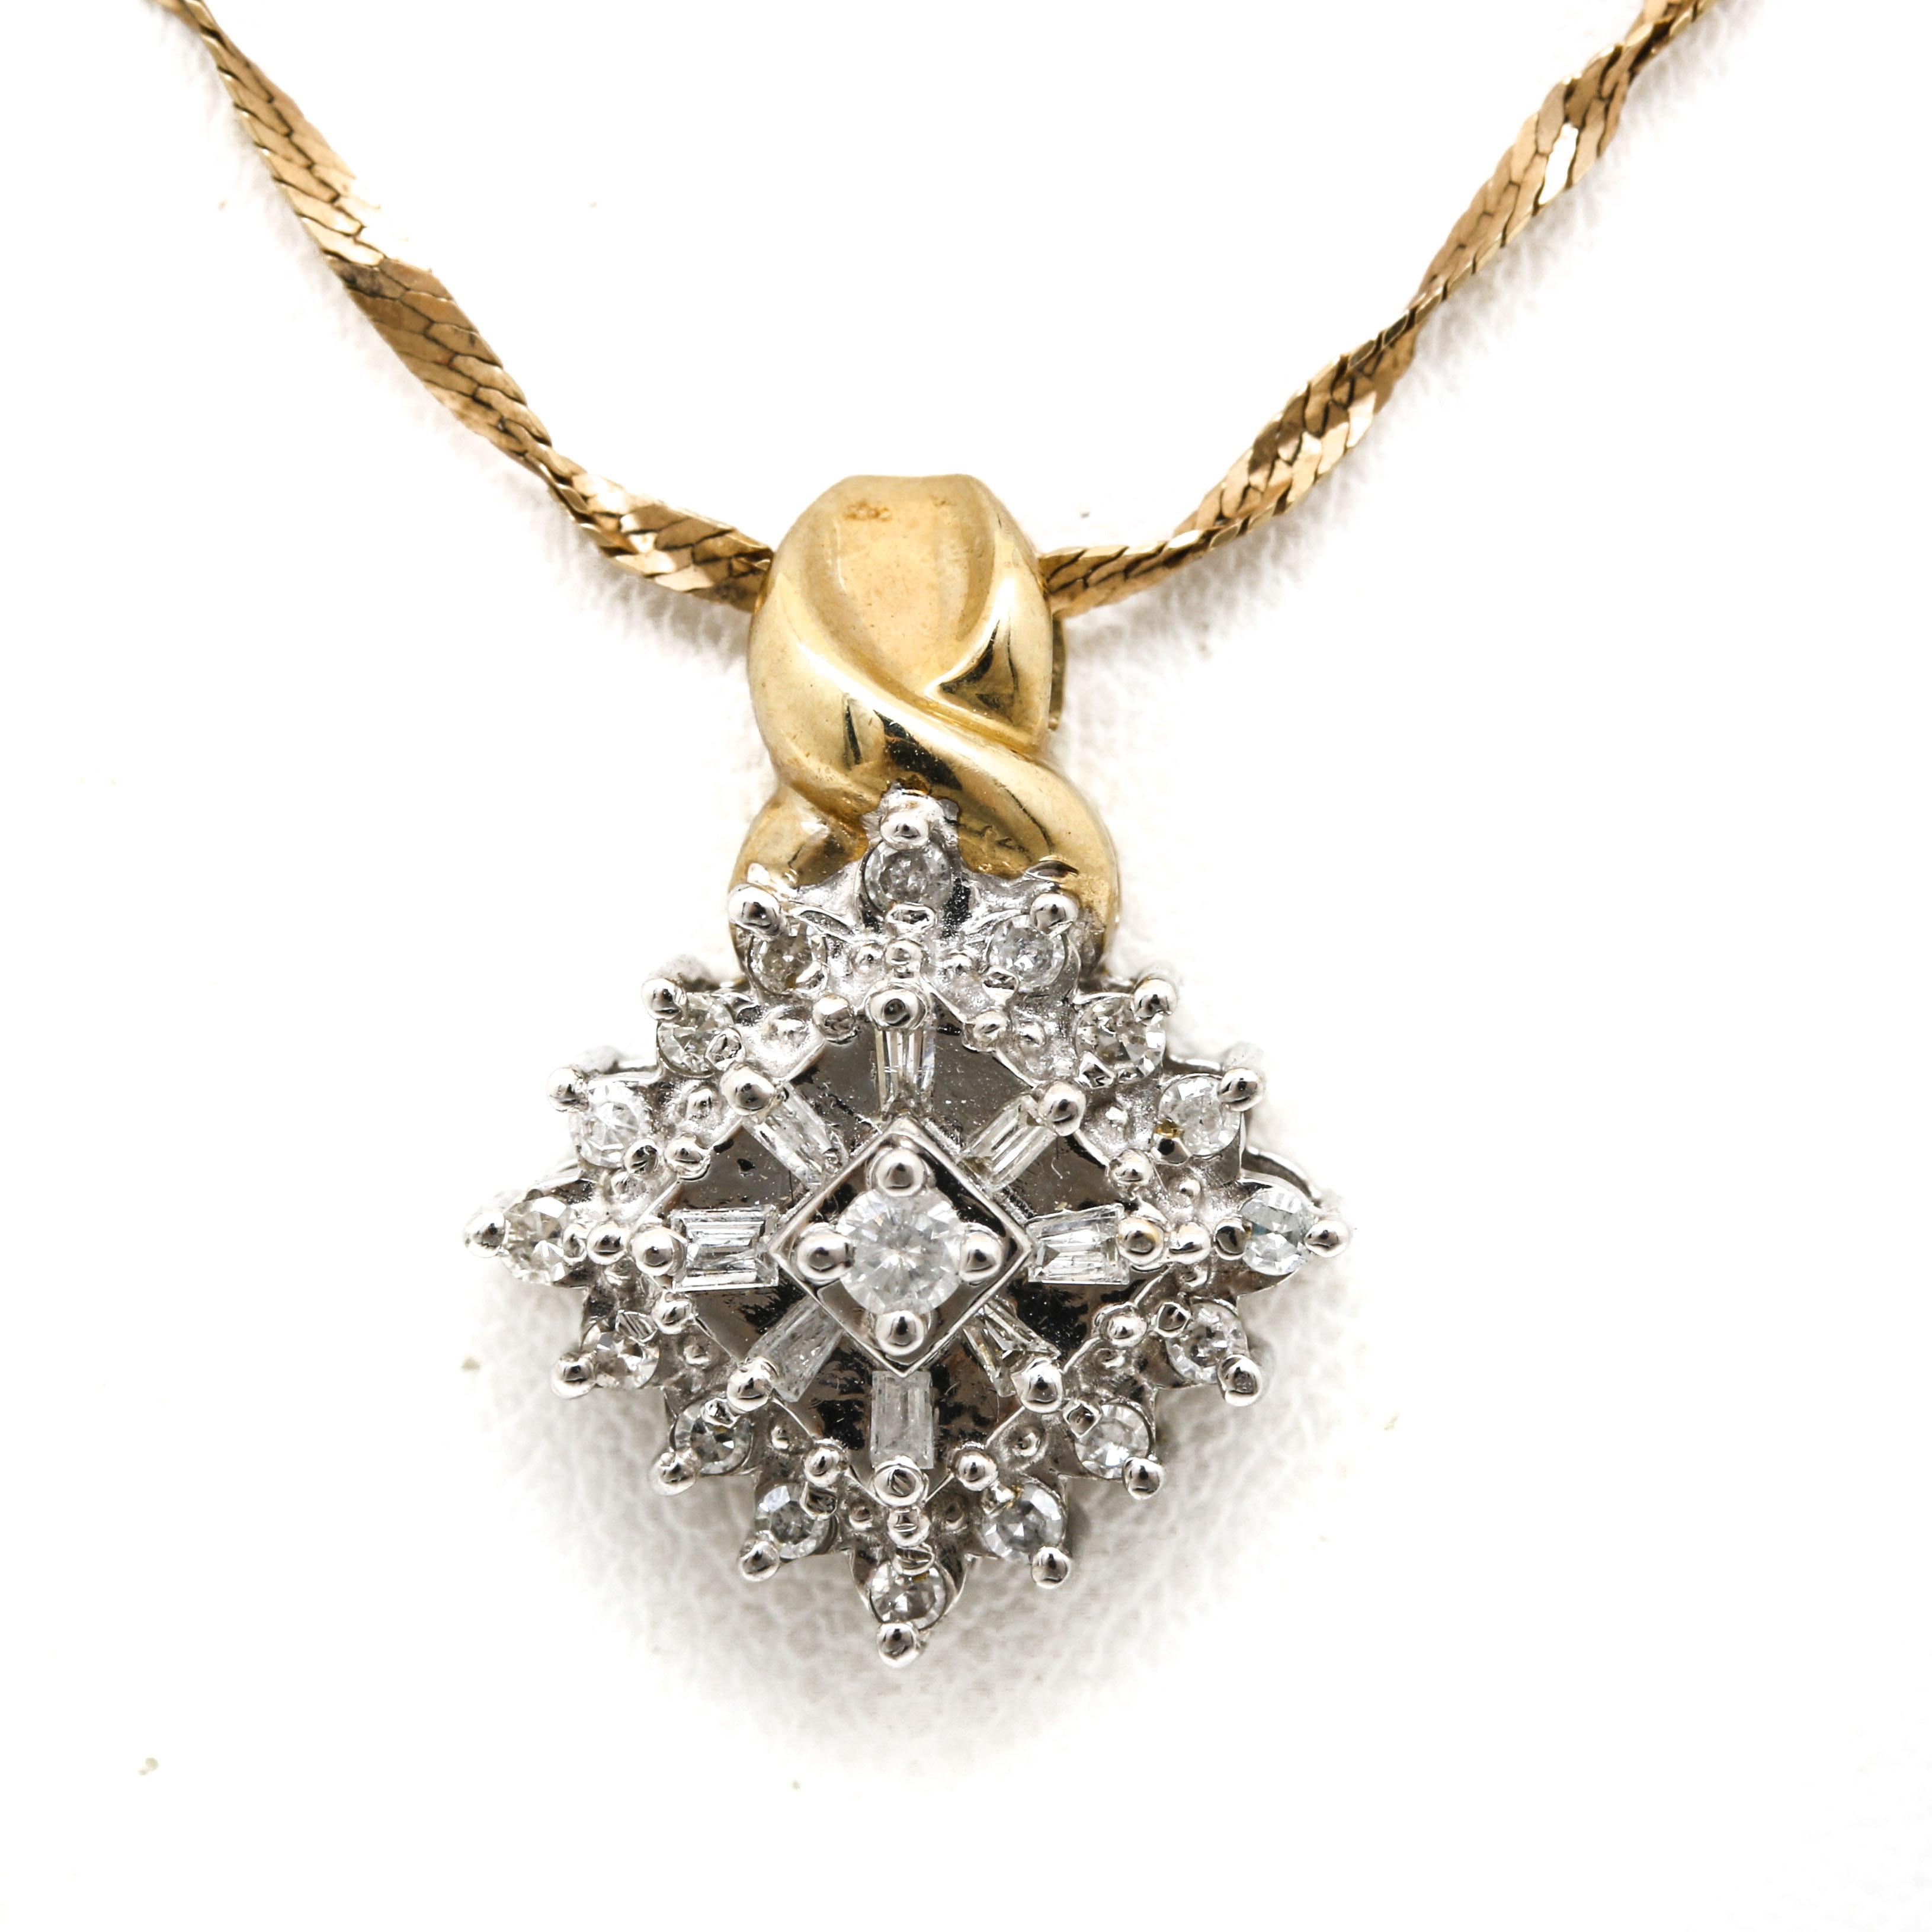 10K Two Tone Gold Diamond Pendant on a 14K Yellow Gold Chain